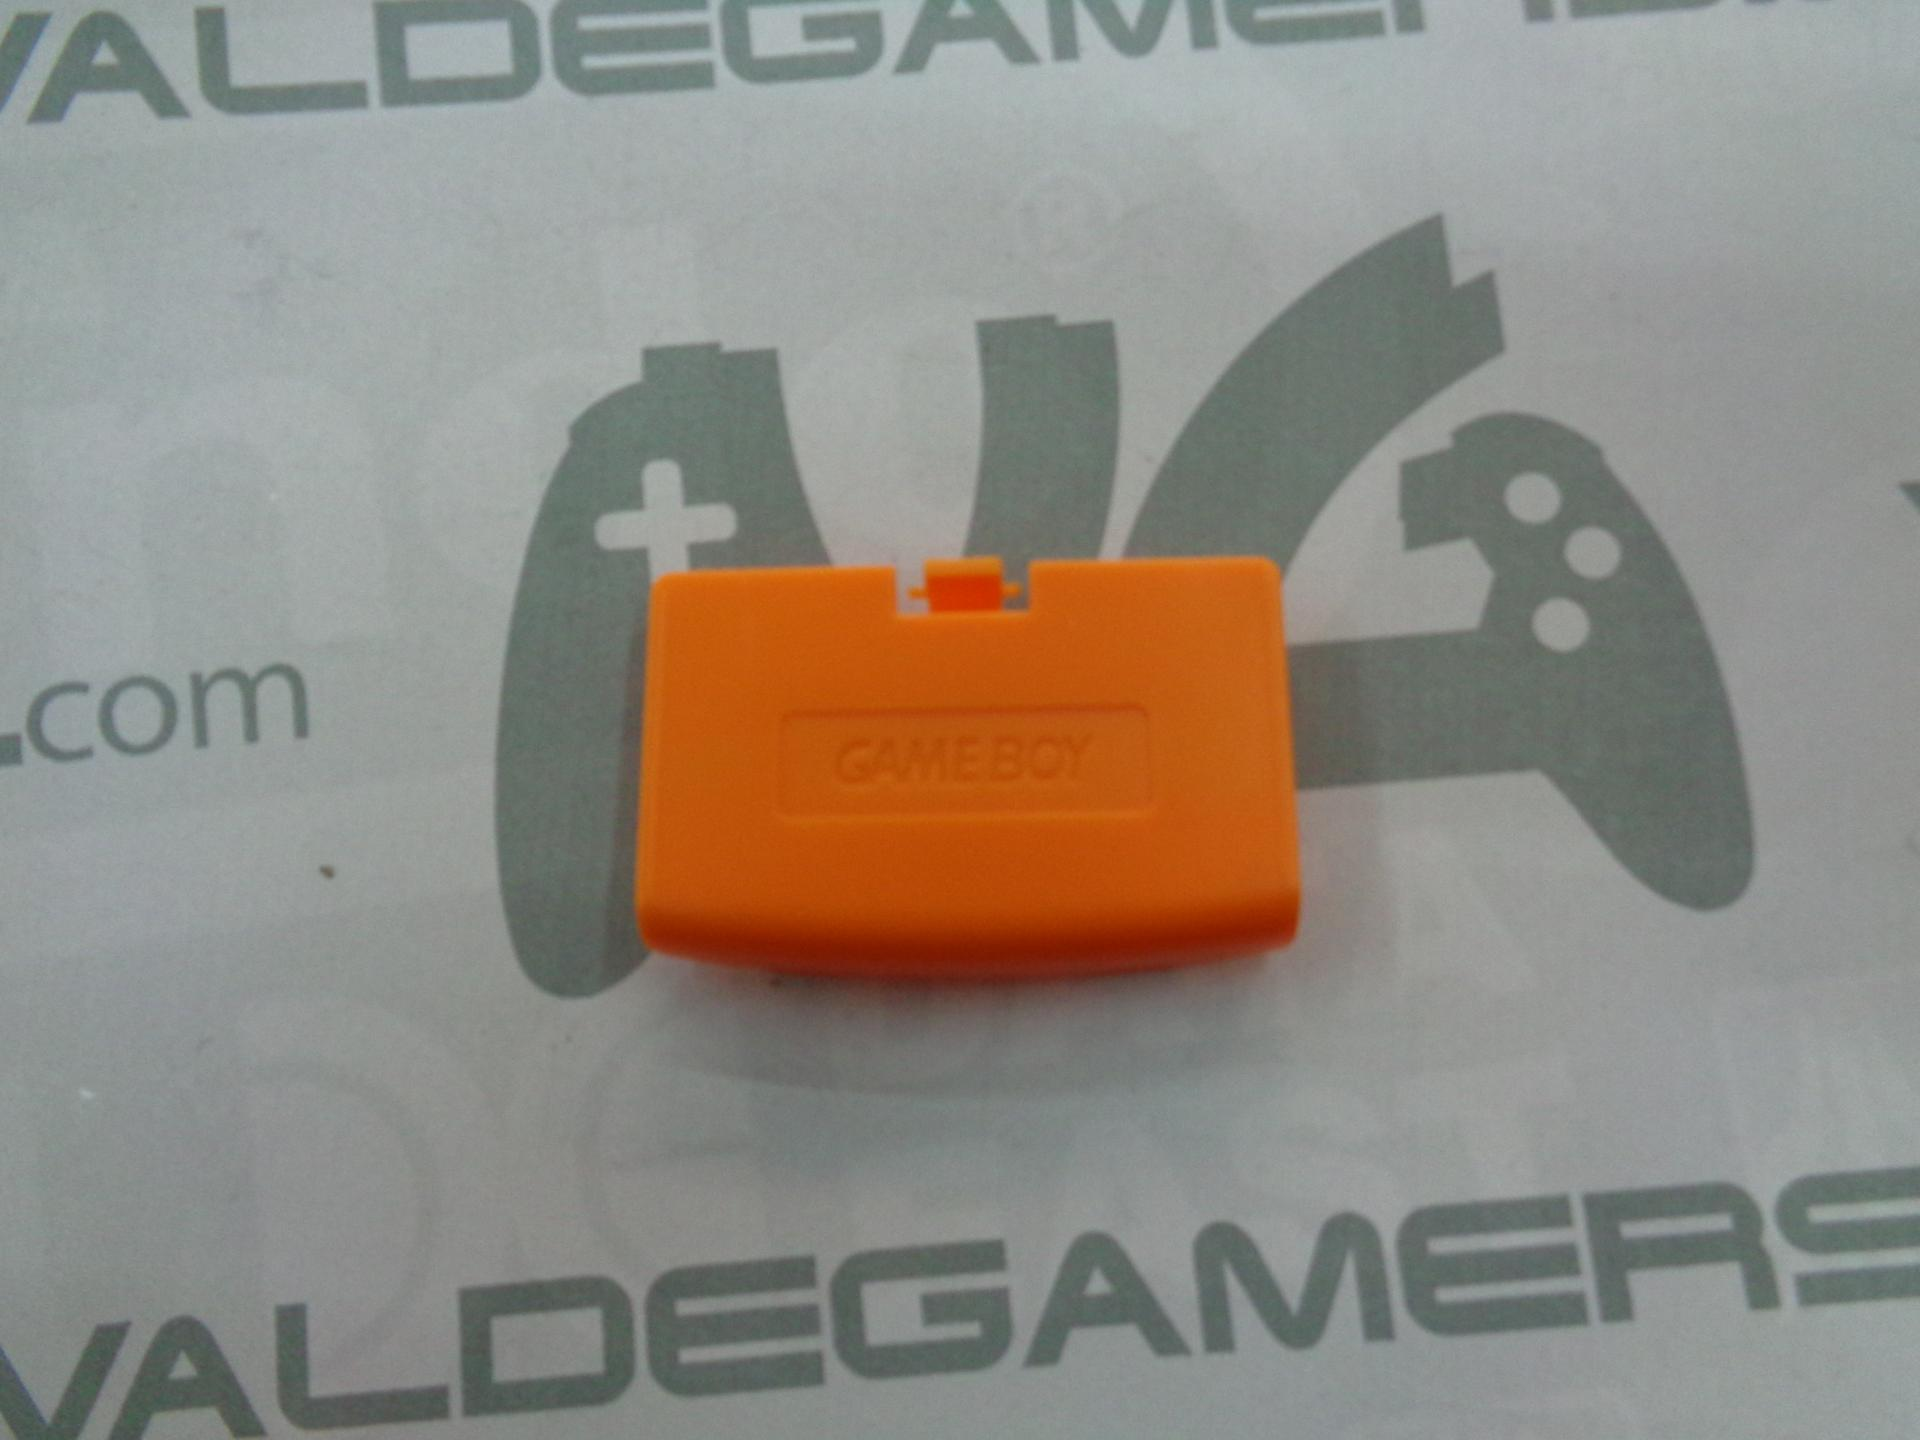 tapa de pilas game boy advance naranja - NUEVO